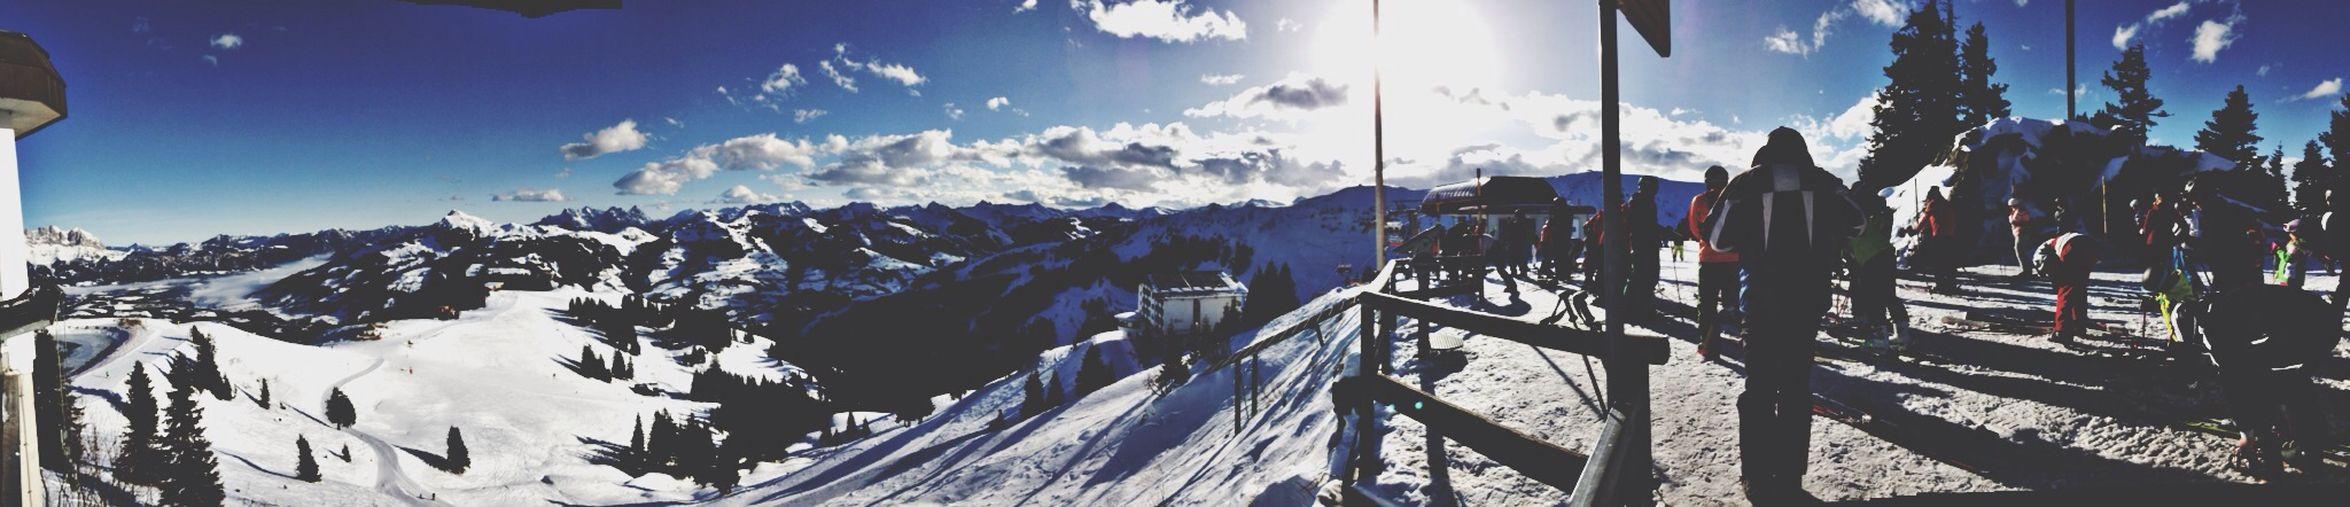 Skilaufen Kitbühel Wochende